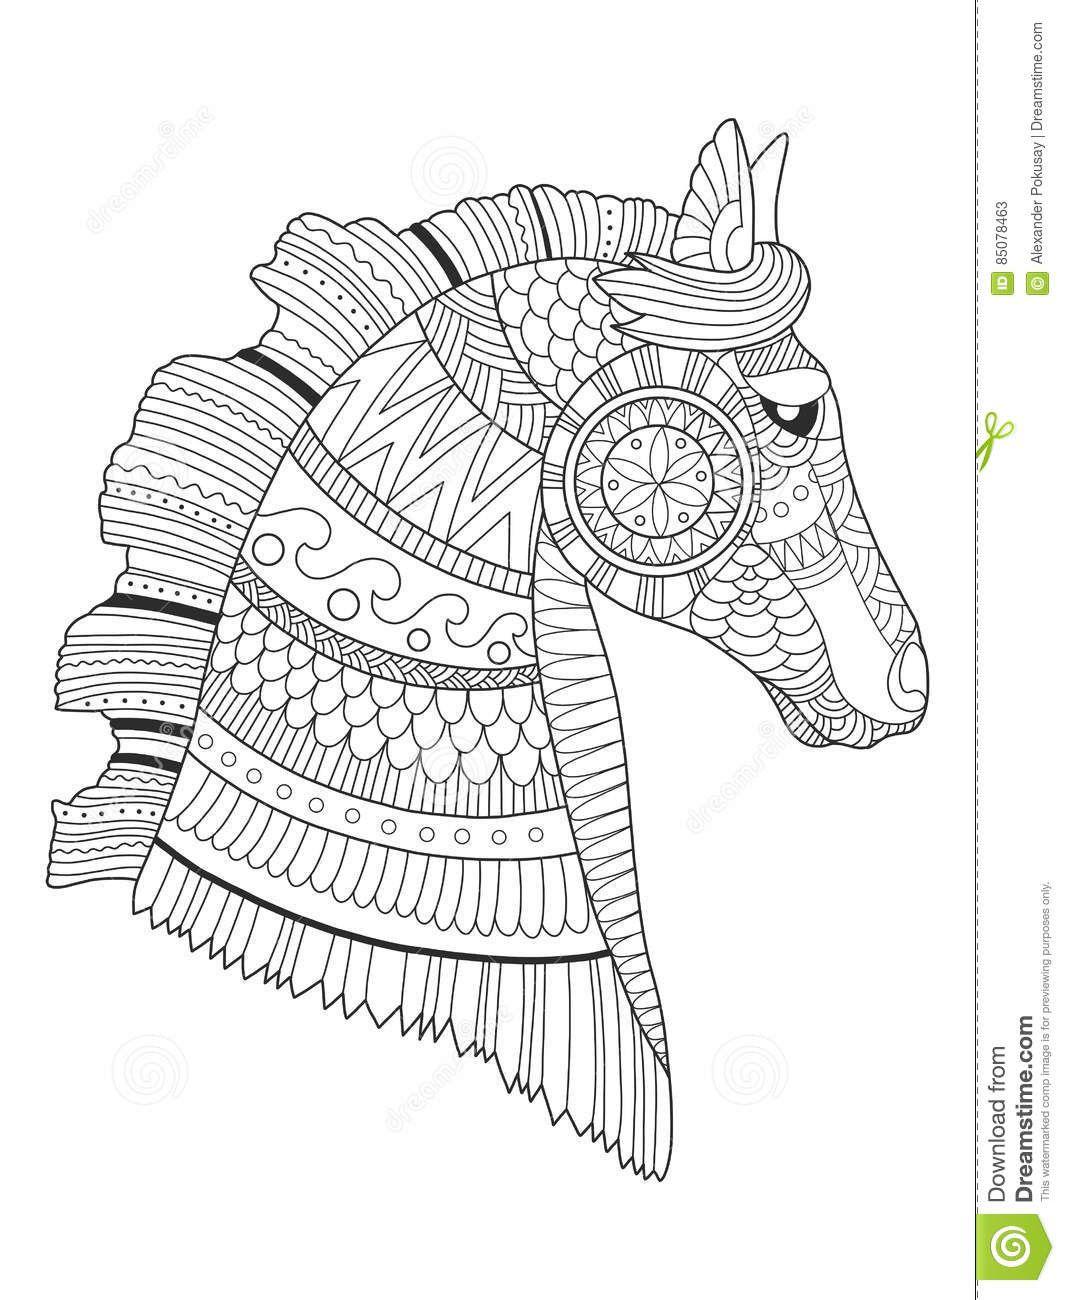 Trojan Horse Coloring Page Youngandtae Com Horse Coloring Pages Horse Coloring Books Coloring Pages [ 1300 x 1065 Pixel ]